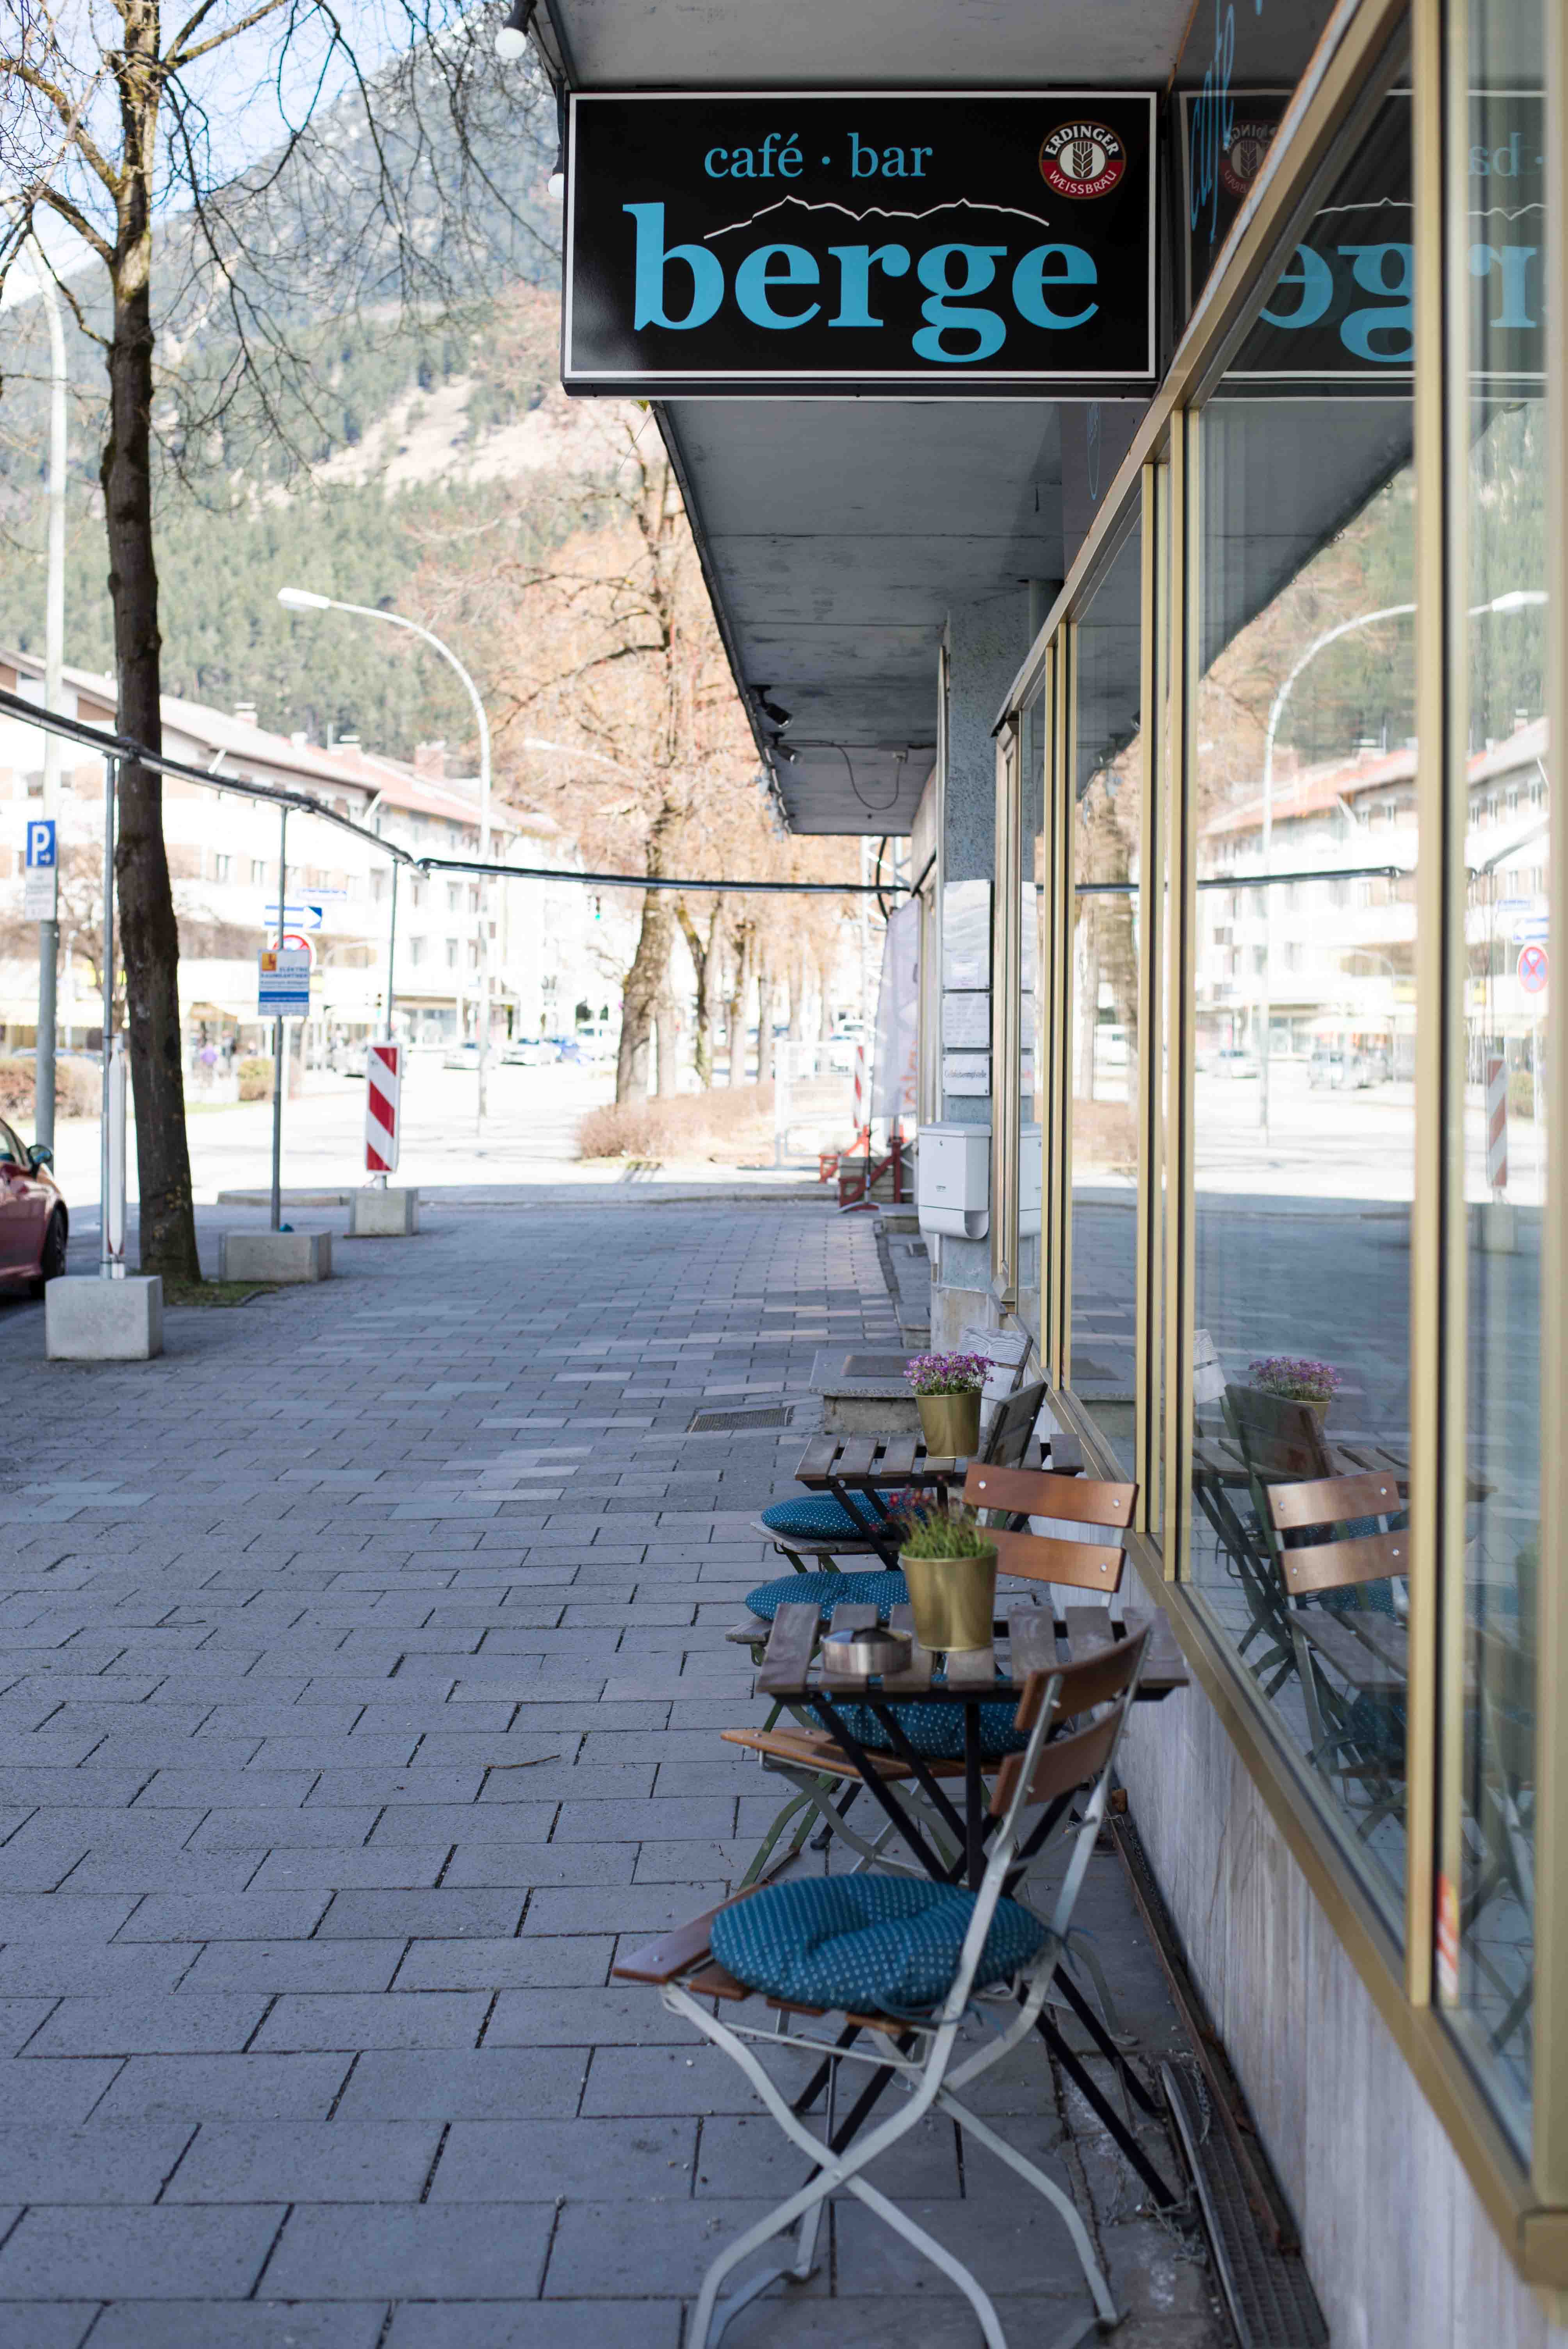 Café Berge in Garmisch-Partenkirchen